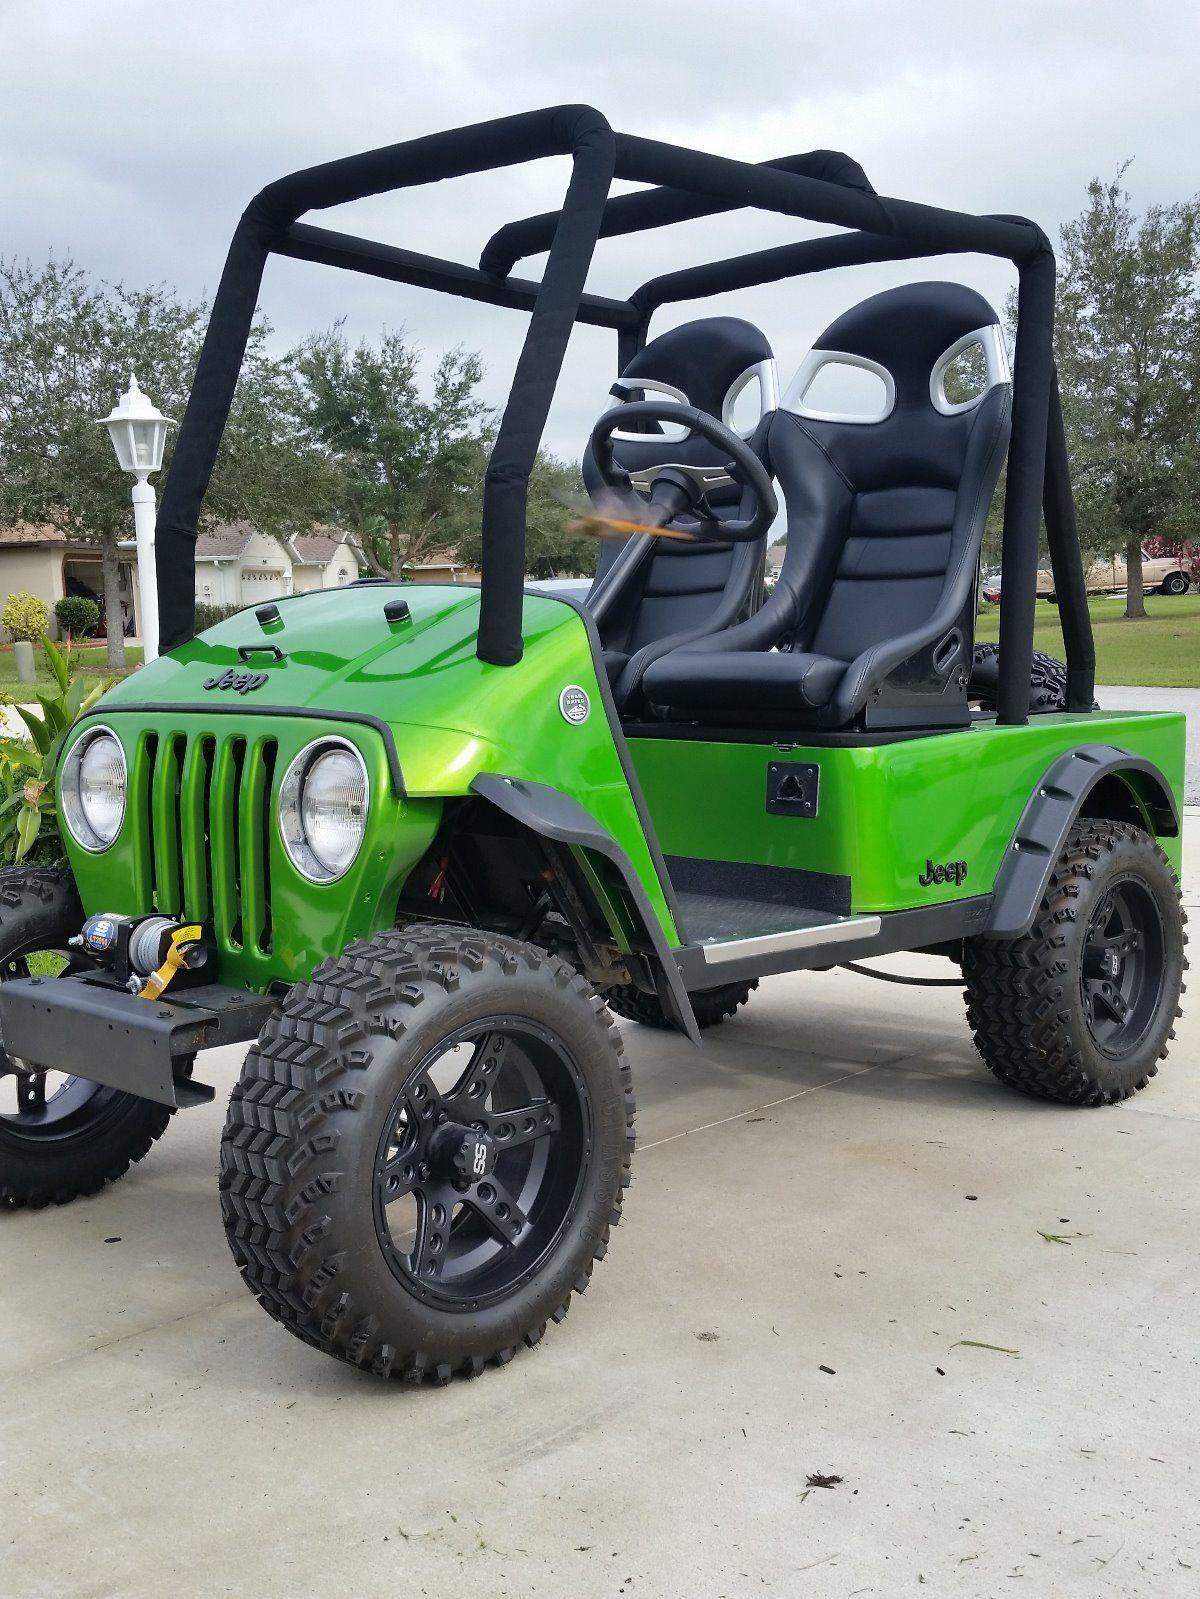 EZGO TXT 2011 Golf Cart Jeep | Golf carts for sale | Pinterest ... Ezgo Golf Cart Vector Logo on yamaha golf cart logo, cushman golf cart logo, columbia golf cart logo, star golf cart logo, bad boy golf carts logo, hyundai golf cart logo, jacobson golf cart logo,